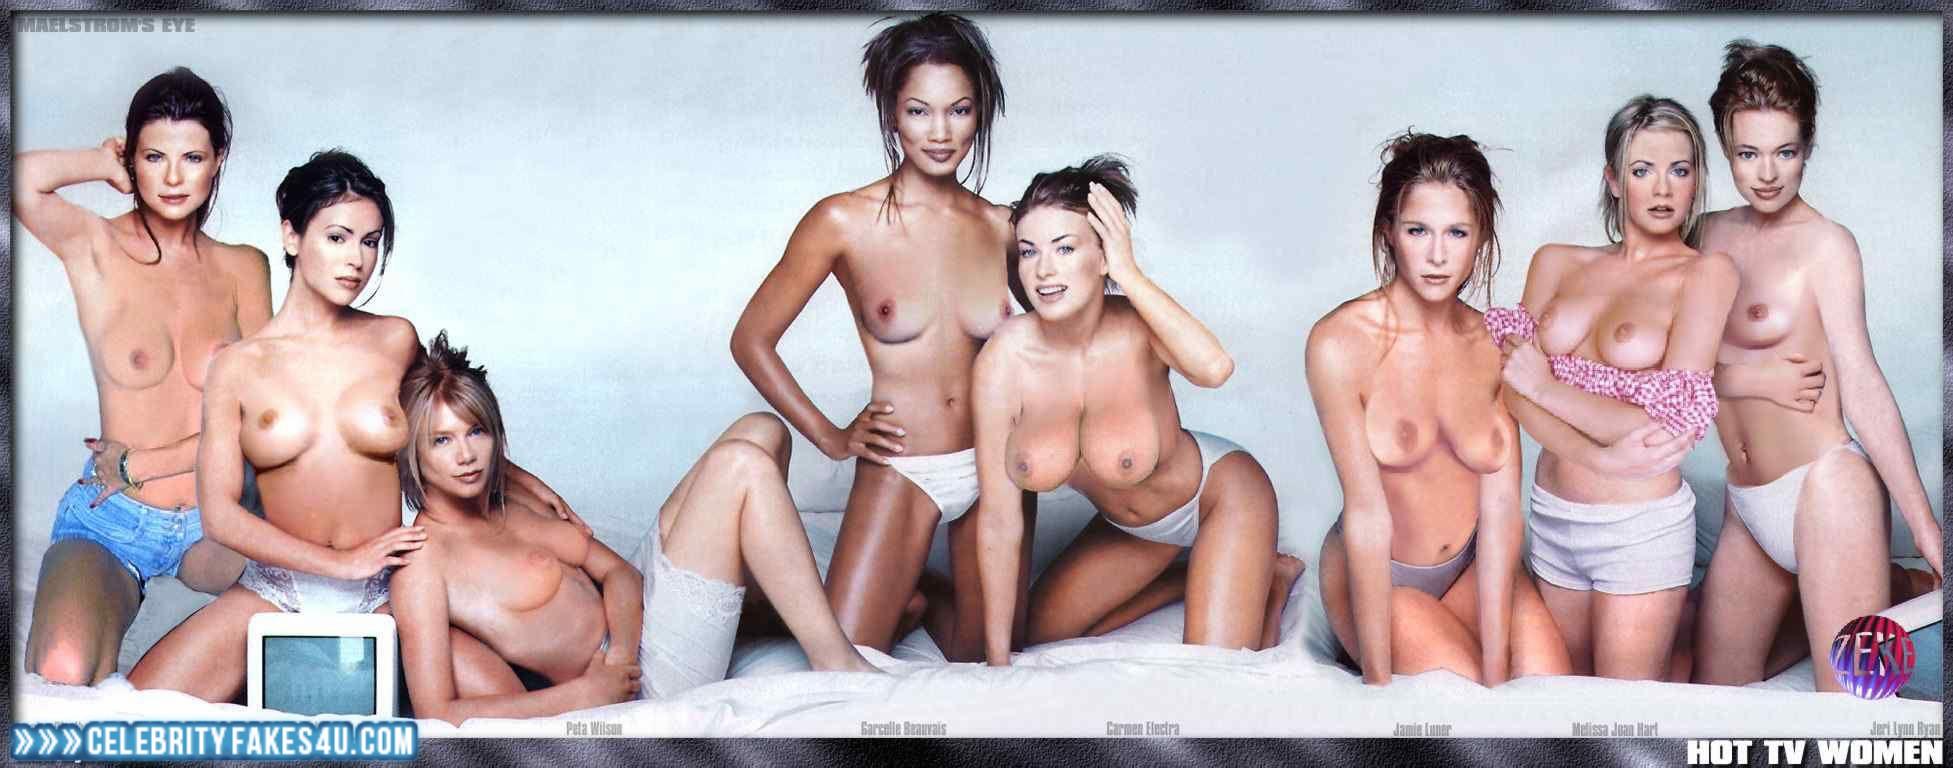 Yasmine bleeth nude in playboy — img 12